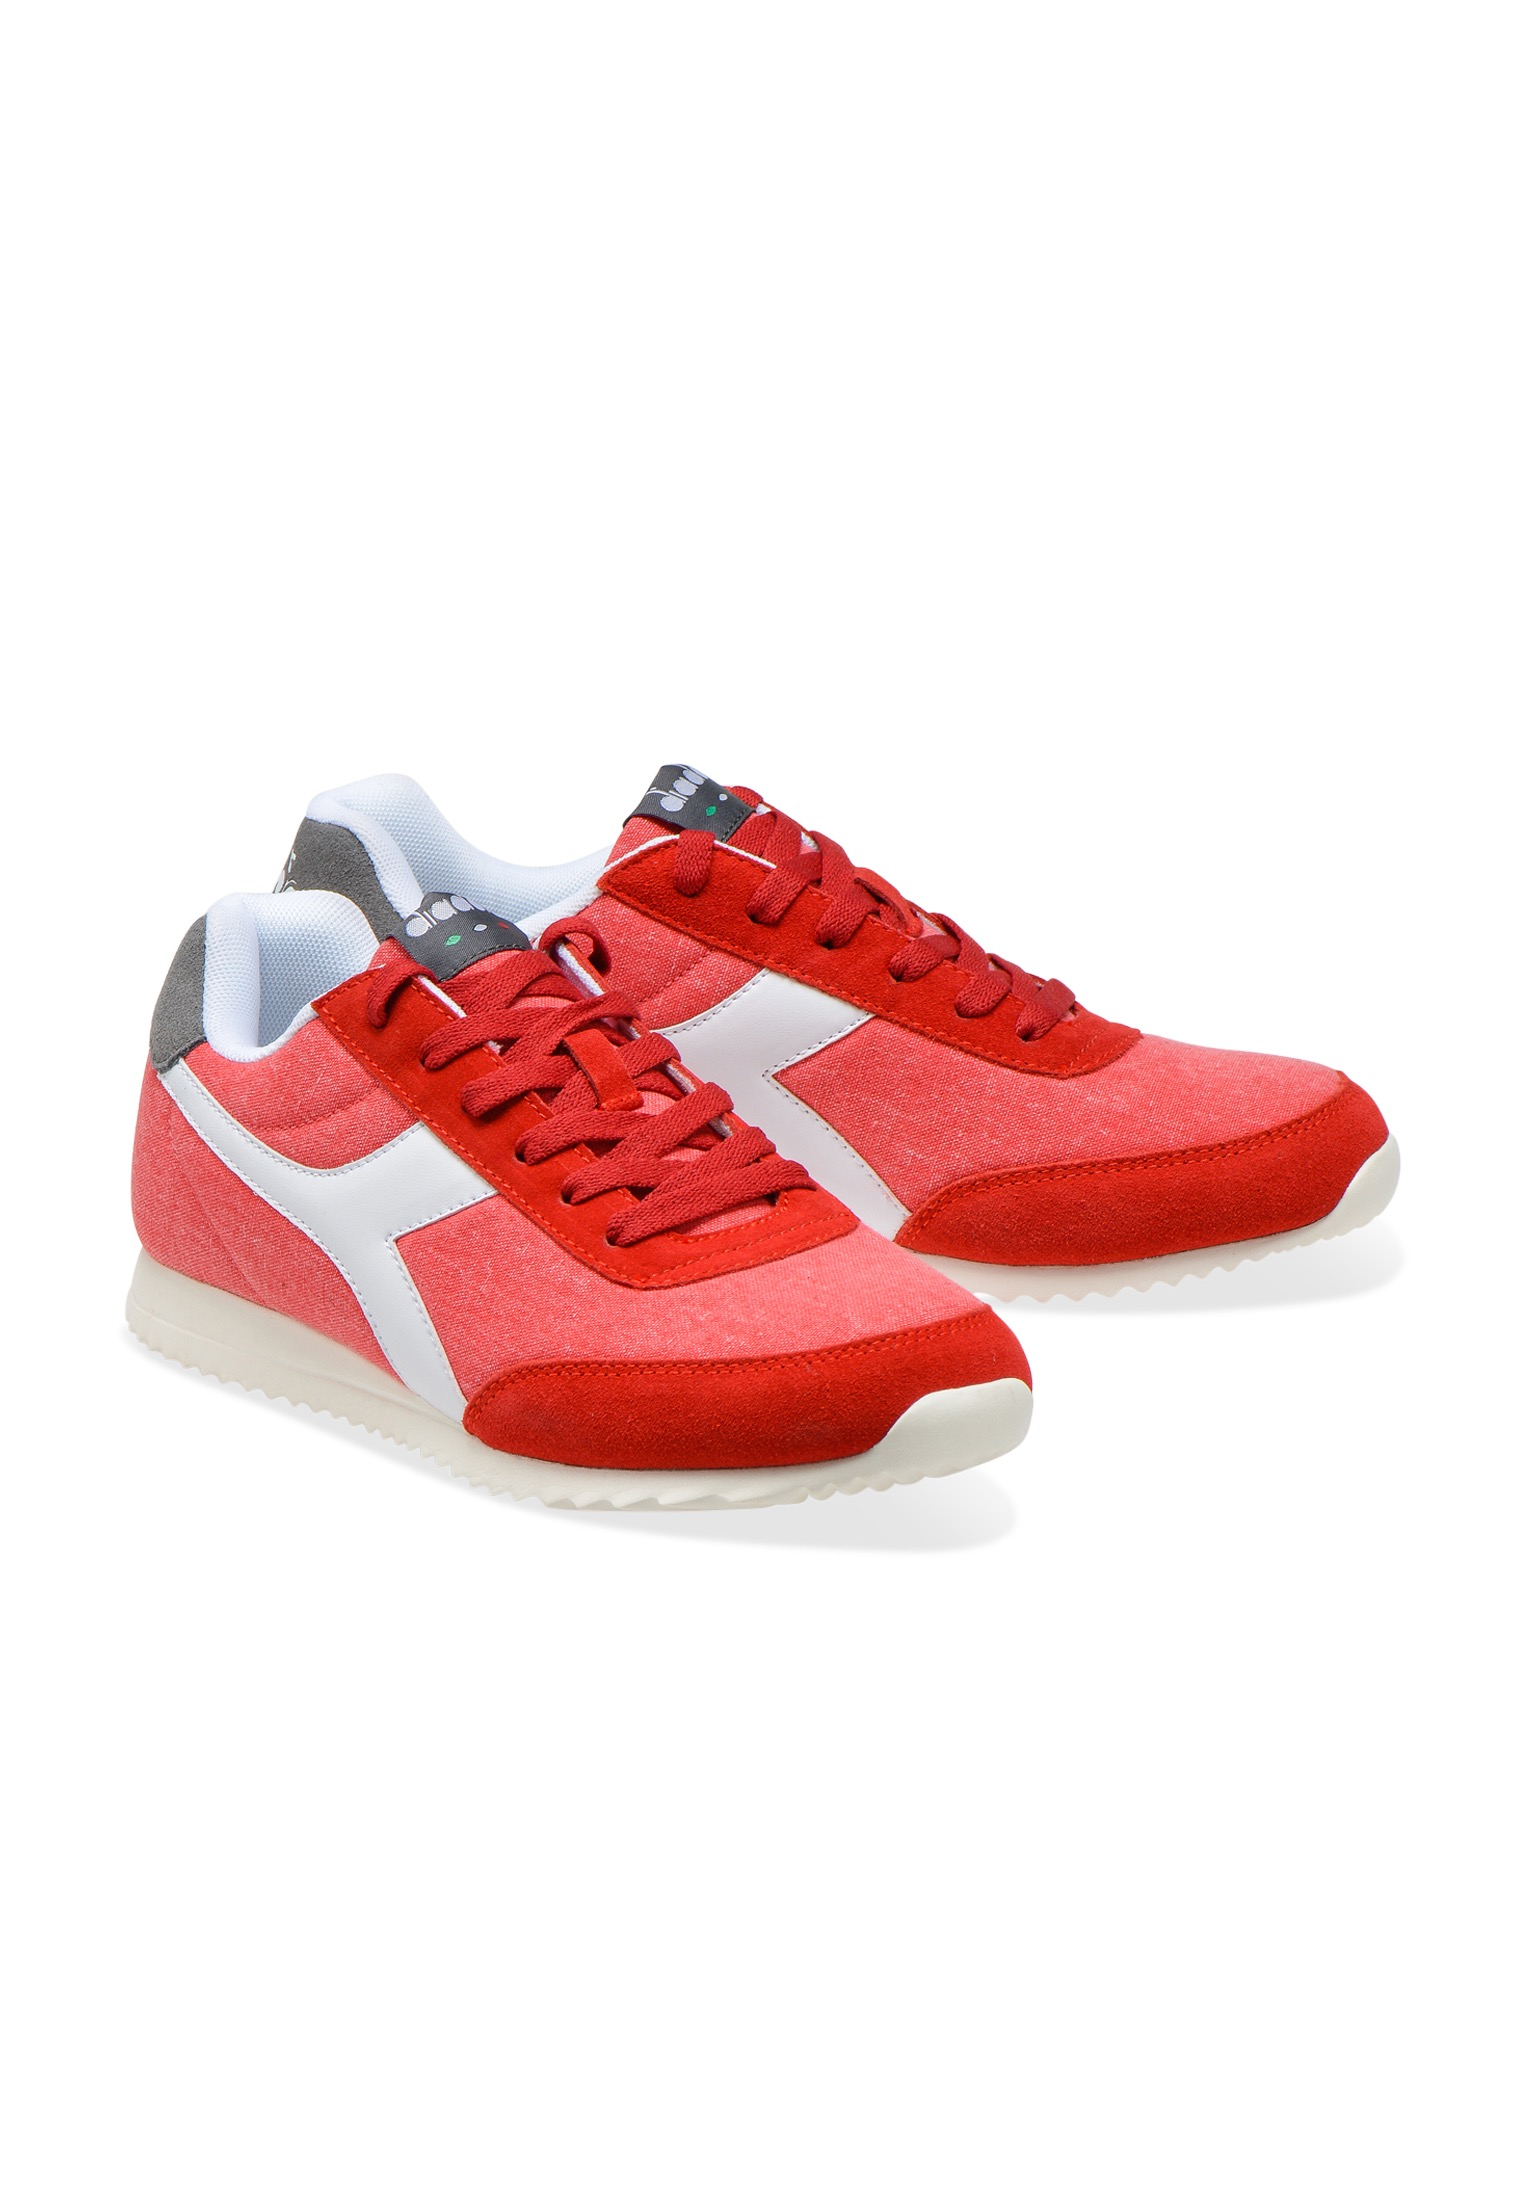 Scarpe-Diadora-Jog-Light-C-Sneakers-sportive-uomo-donna-vari-colori-e-taglie miniatura 89